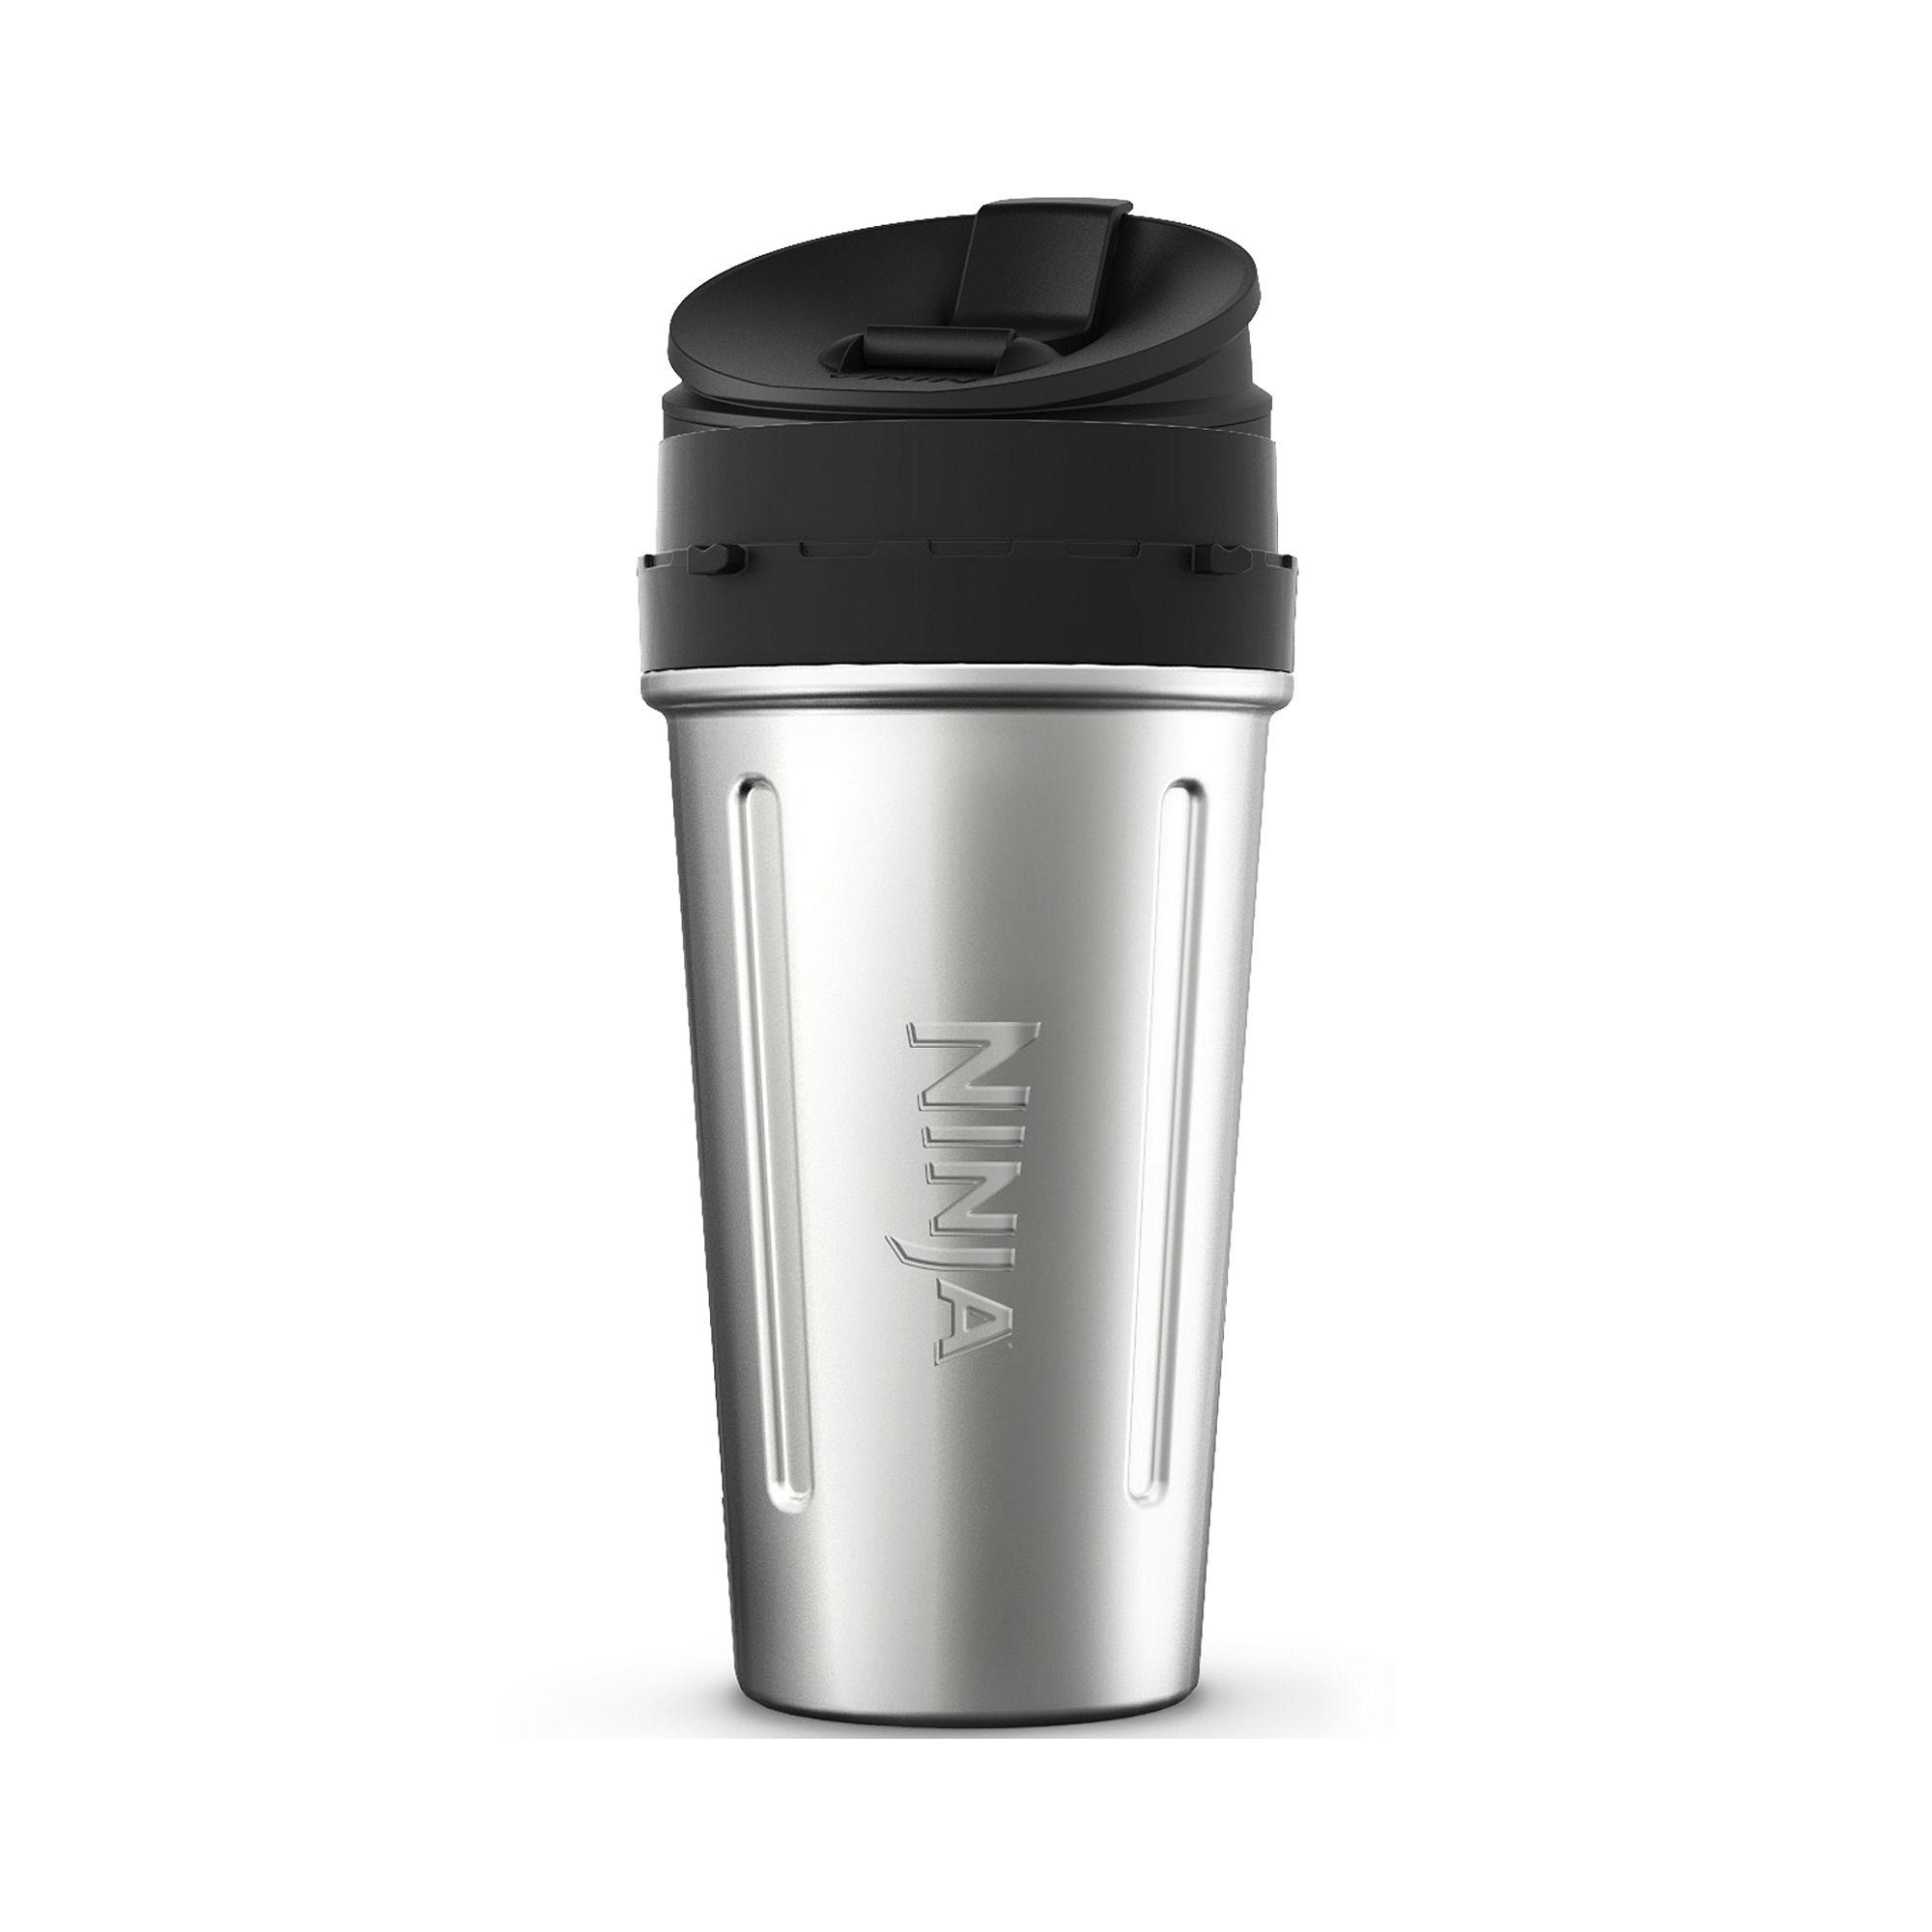 24-oz. Nutri Ninja Pro Stainless Steel Commuter Cup